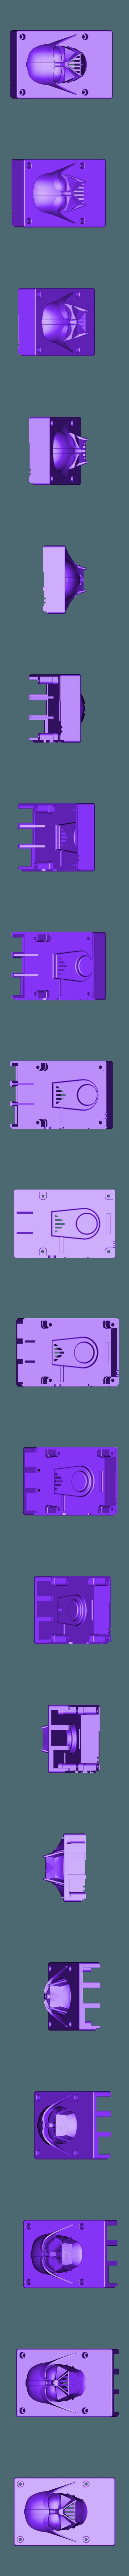 dessus.stl Download free STL file raspberry pi 3 b/b+ Star Wars shell • 3D printer template, designprojetscolaire